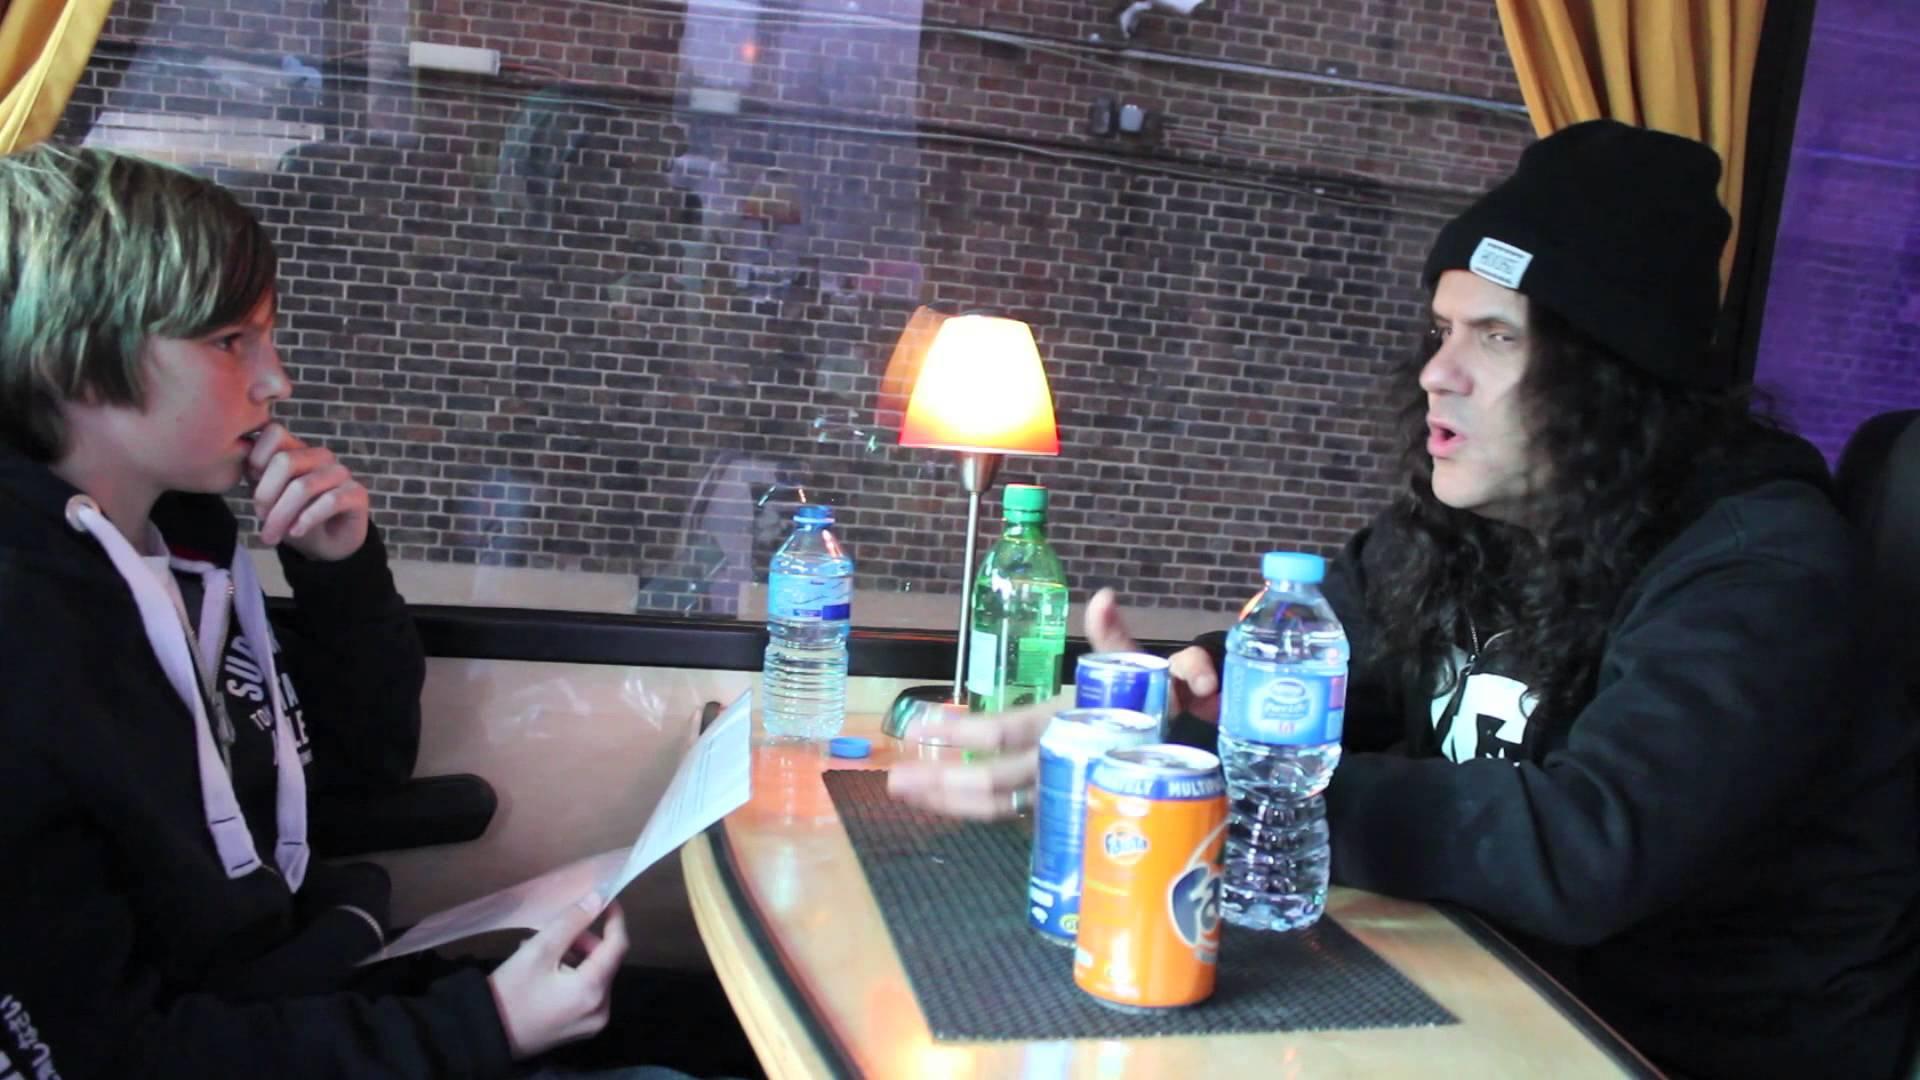 KREATOR - EQPTV & Mille Discuss Kreator's Thrash Influence